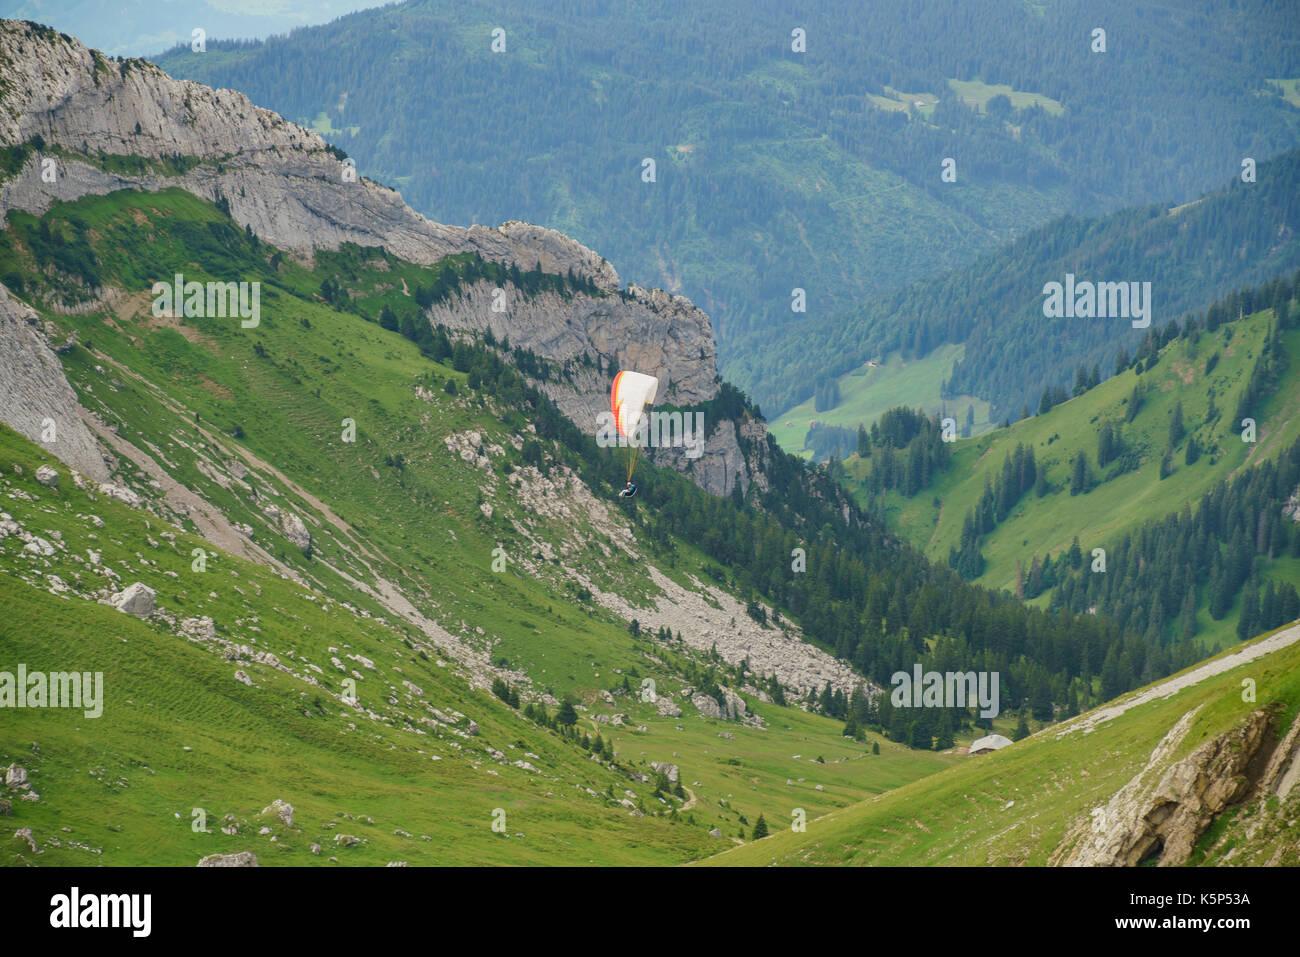 Man playing hang gliding over Mount Pilatus, Lucerne, Switzerland - Stock Image